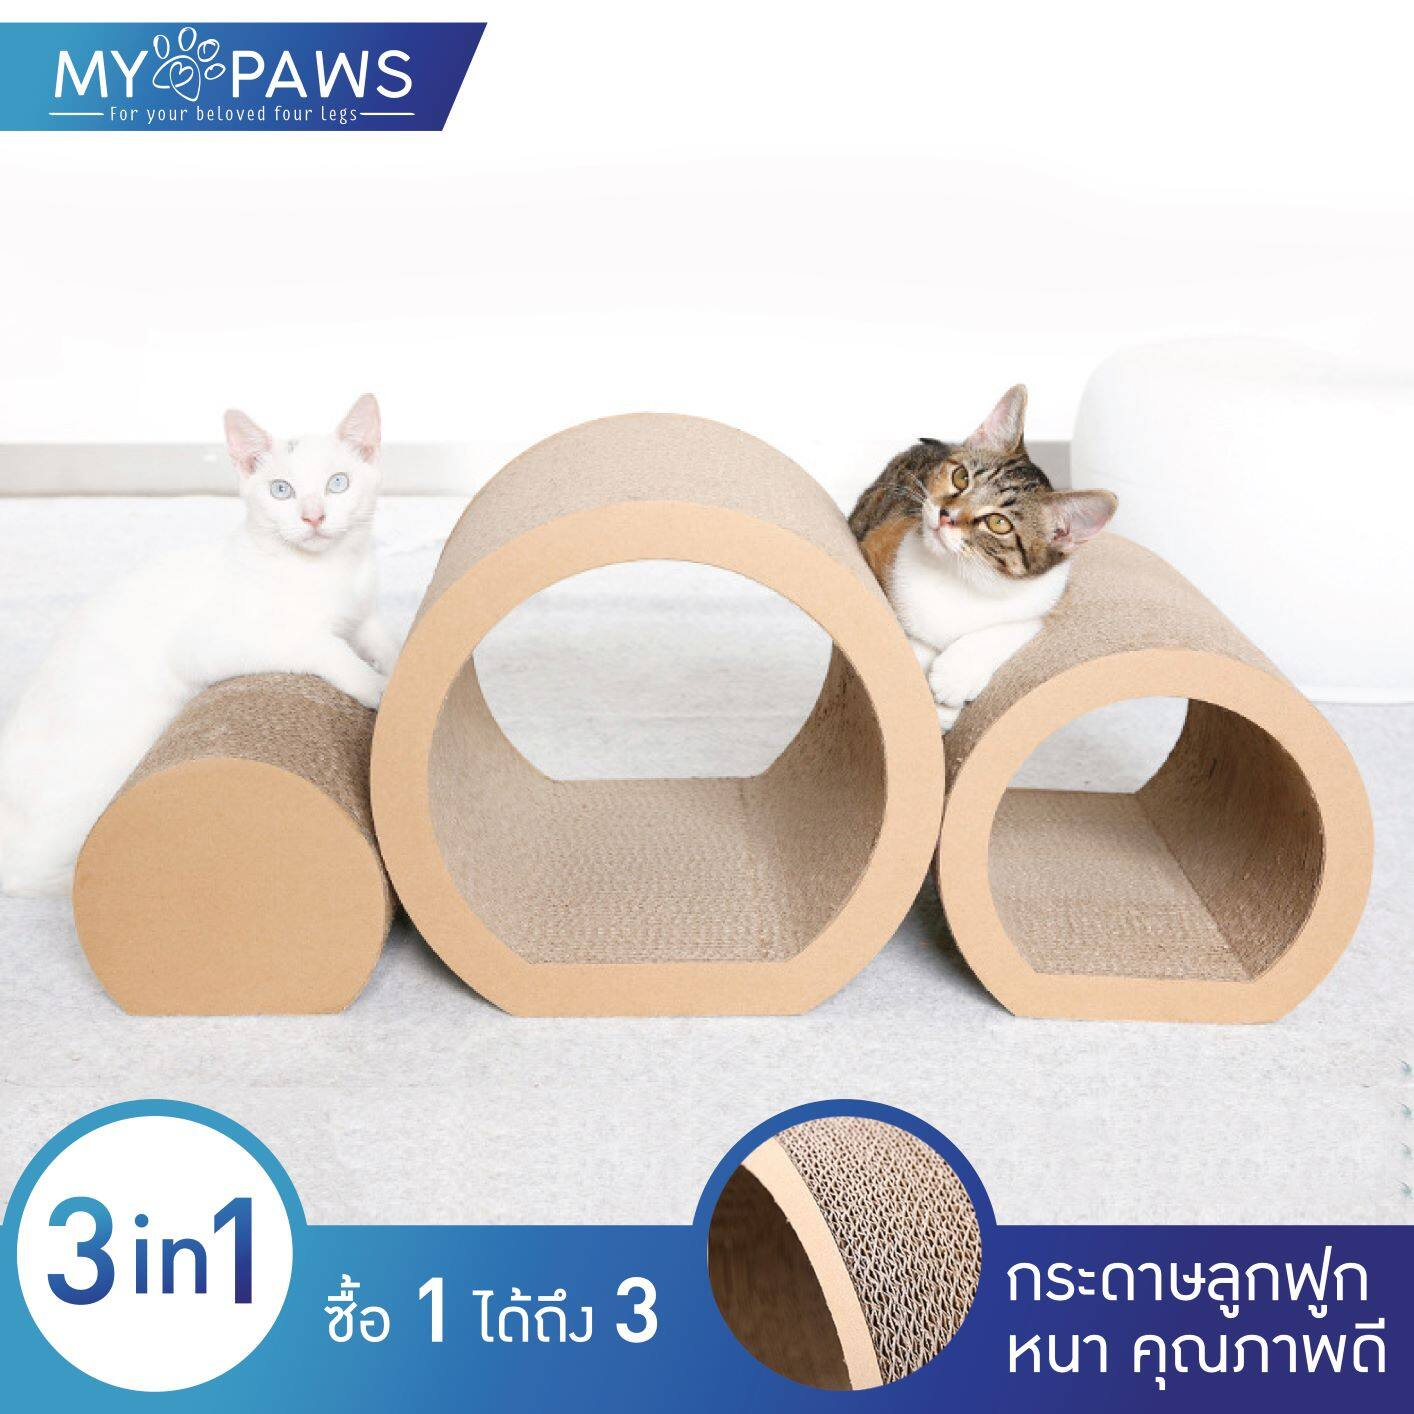 My Paws ที่ลับเล็บแมว ที่ฝนเล็บแมว ของเล่นแมว ดีไซน์สุดพิเศษ 3in1.